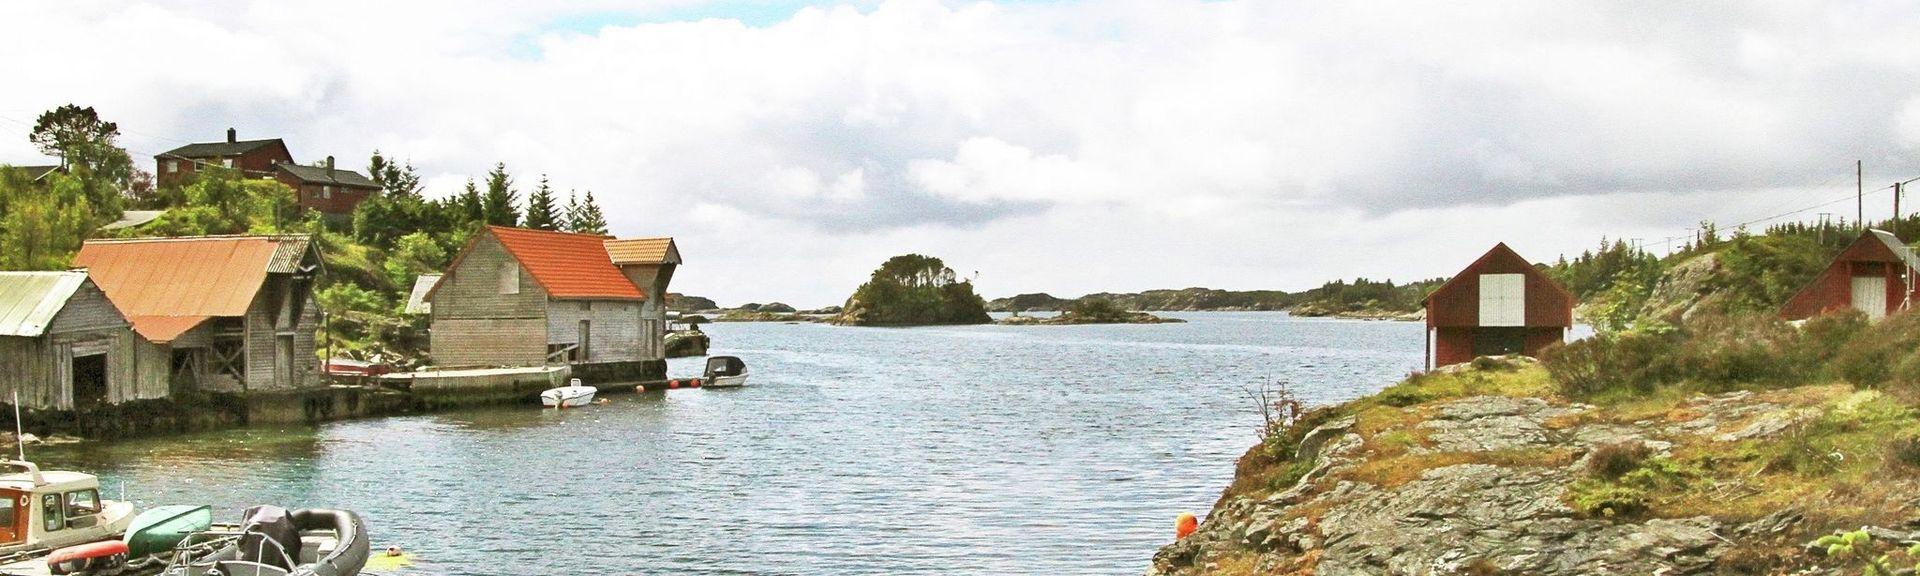 Meland, Norway